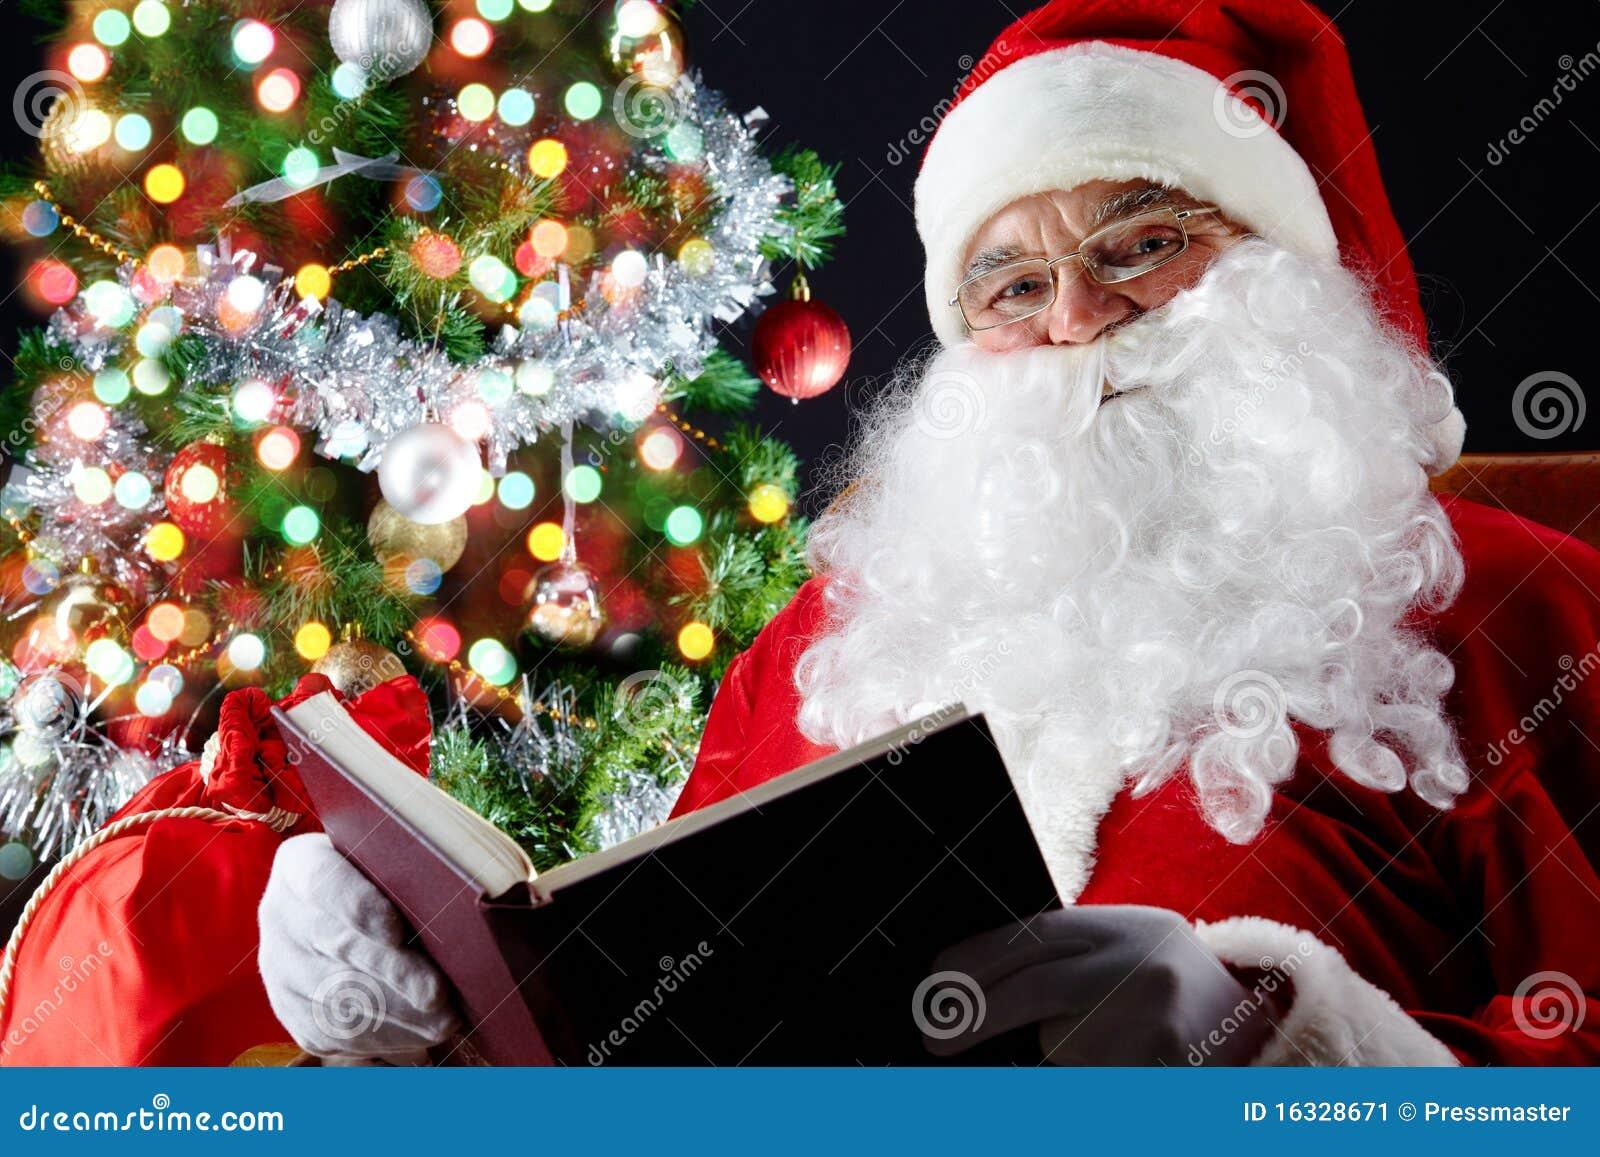 santa reading a book stock image